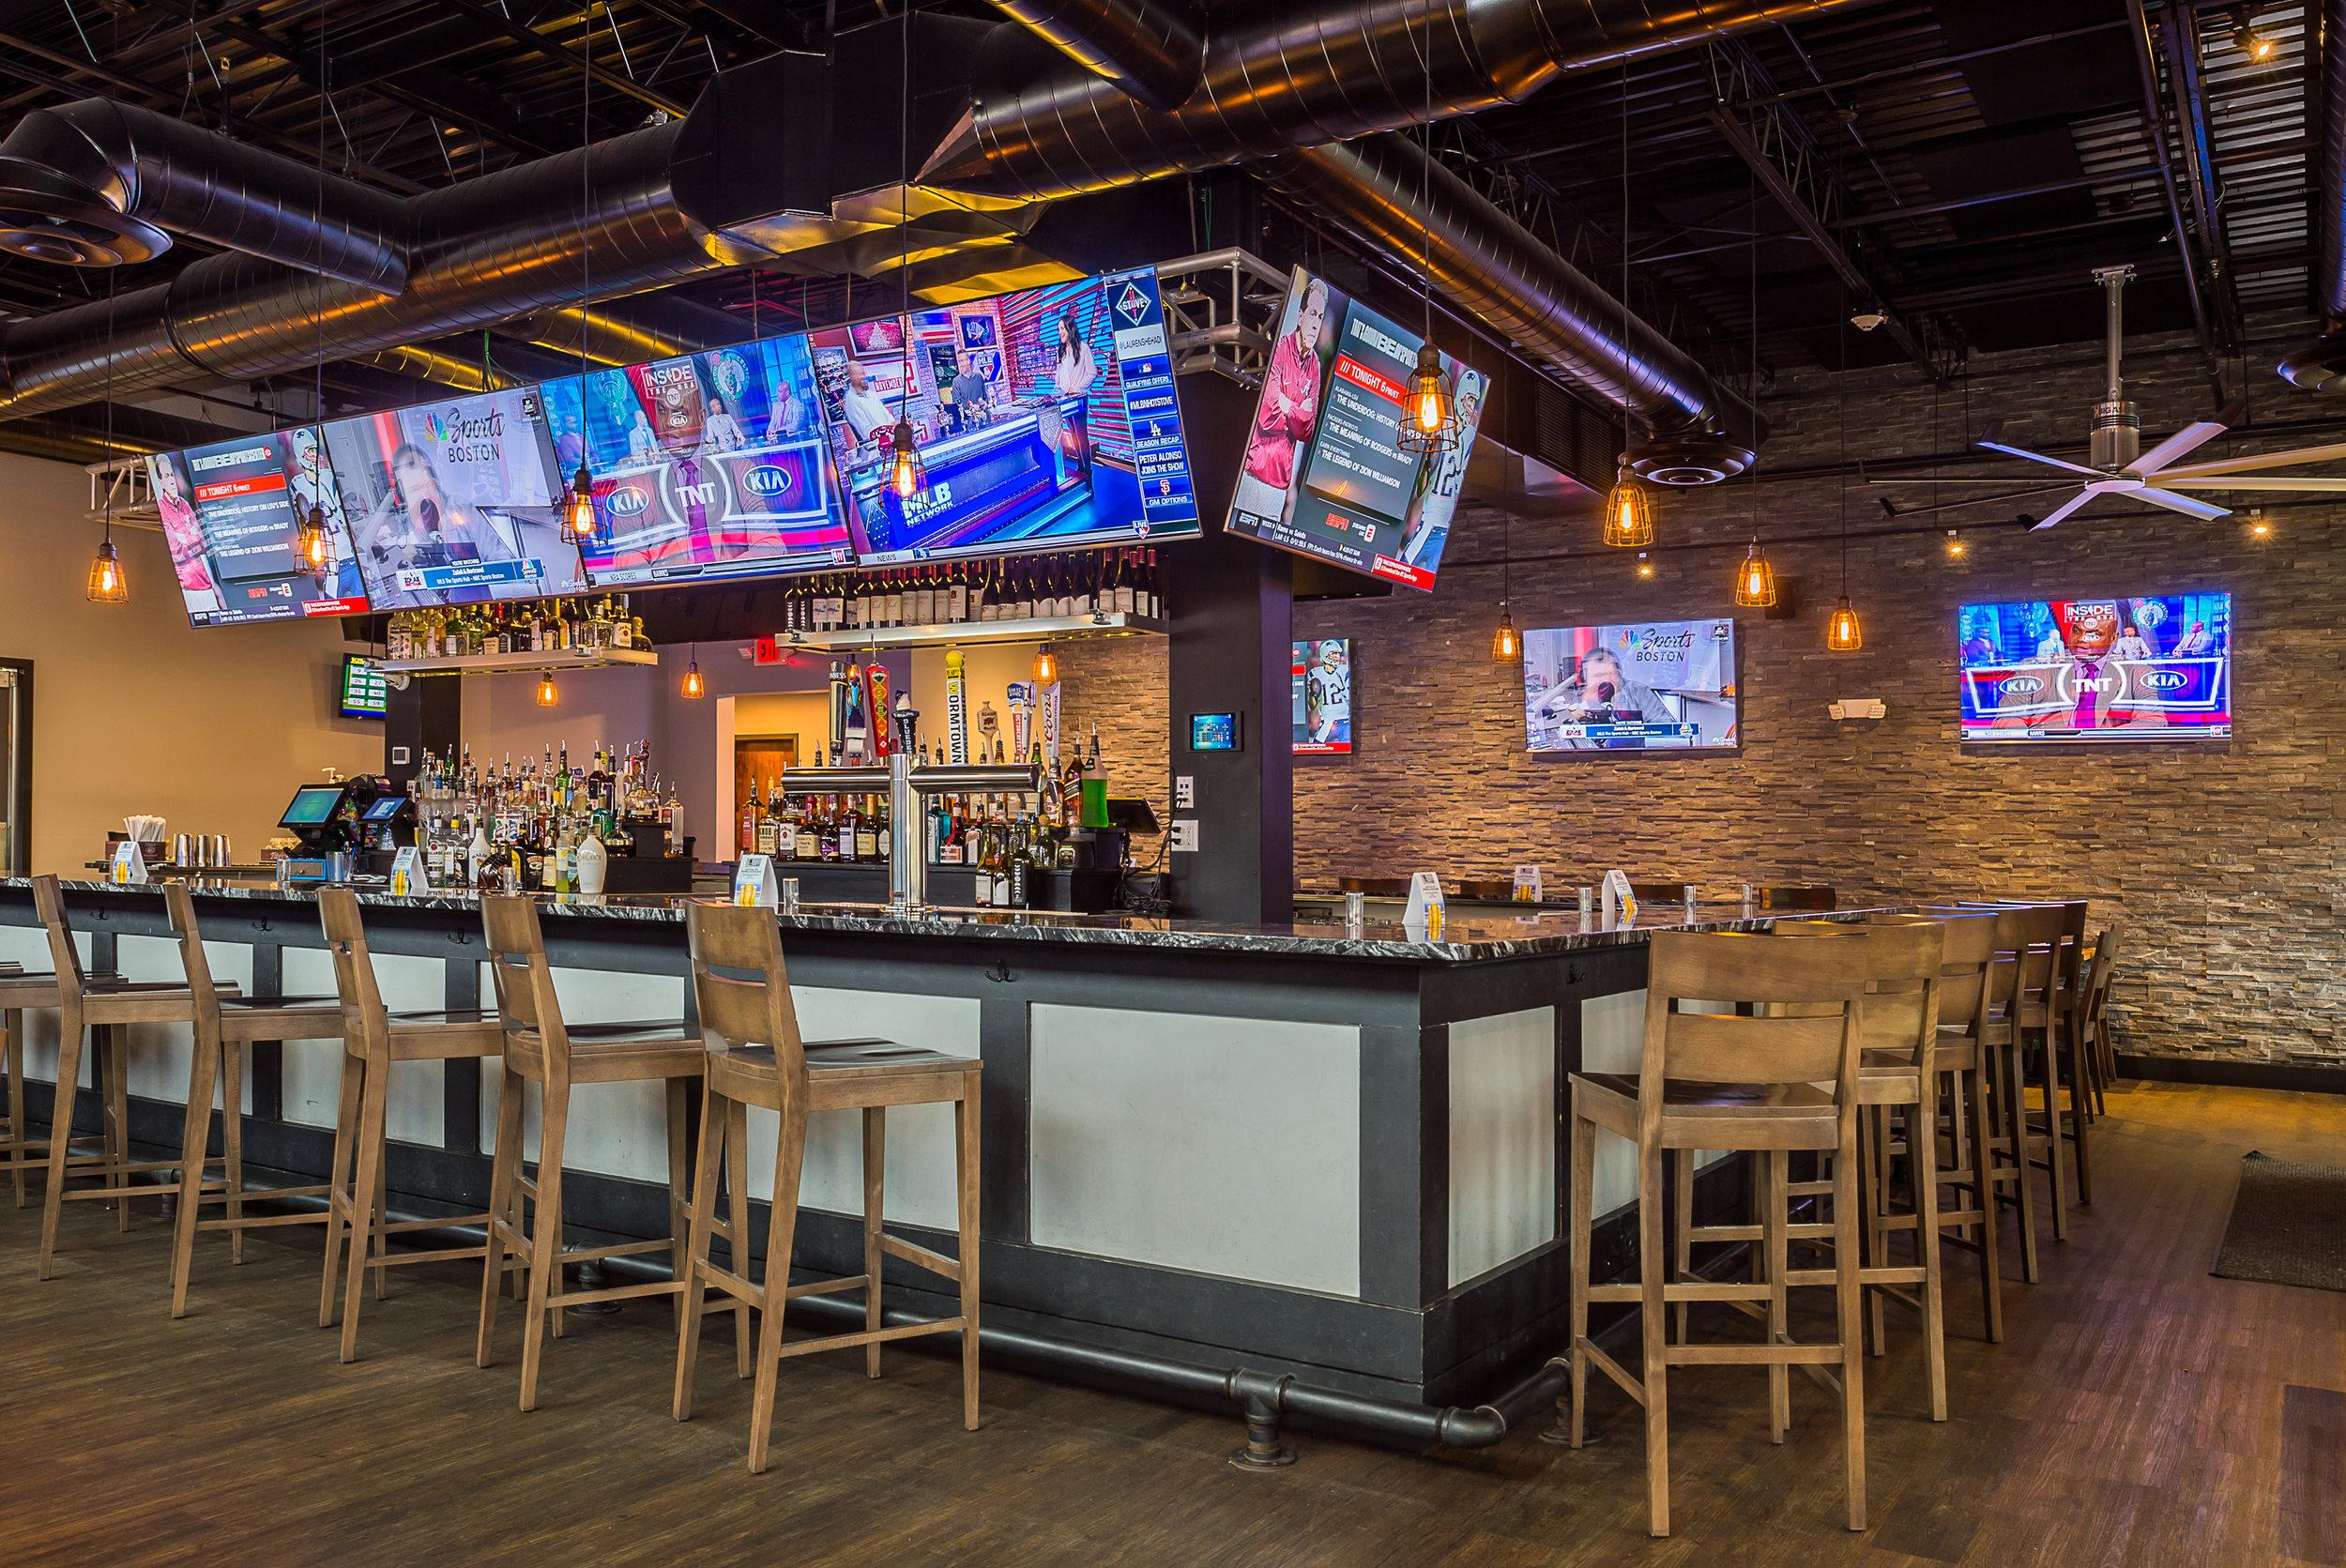 Bates Bar and Grill